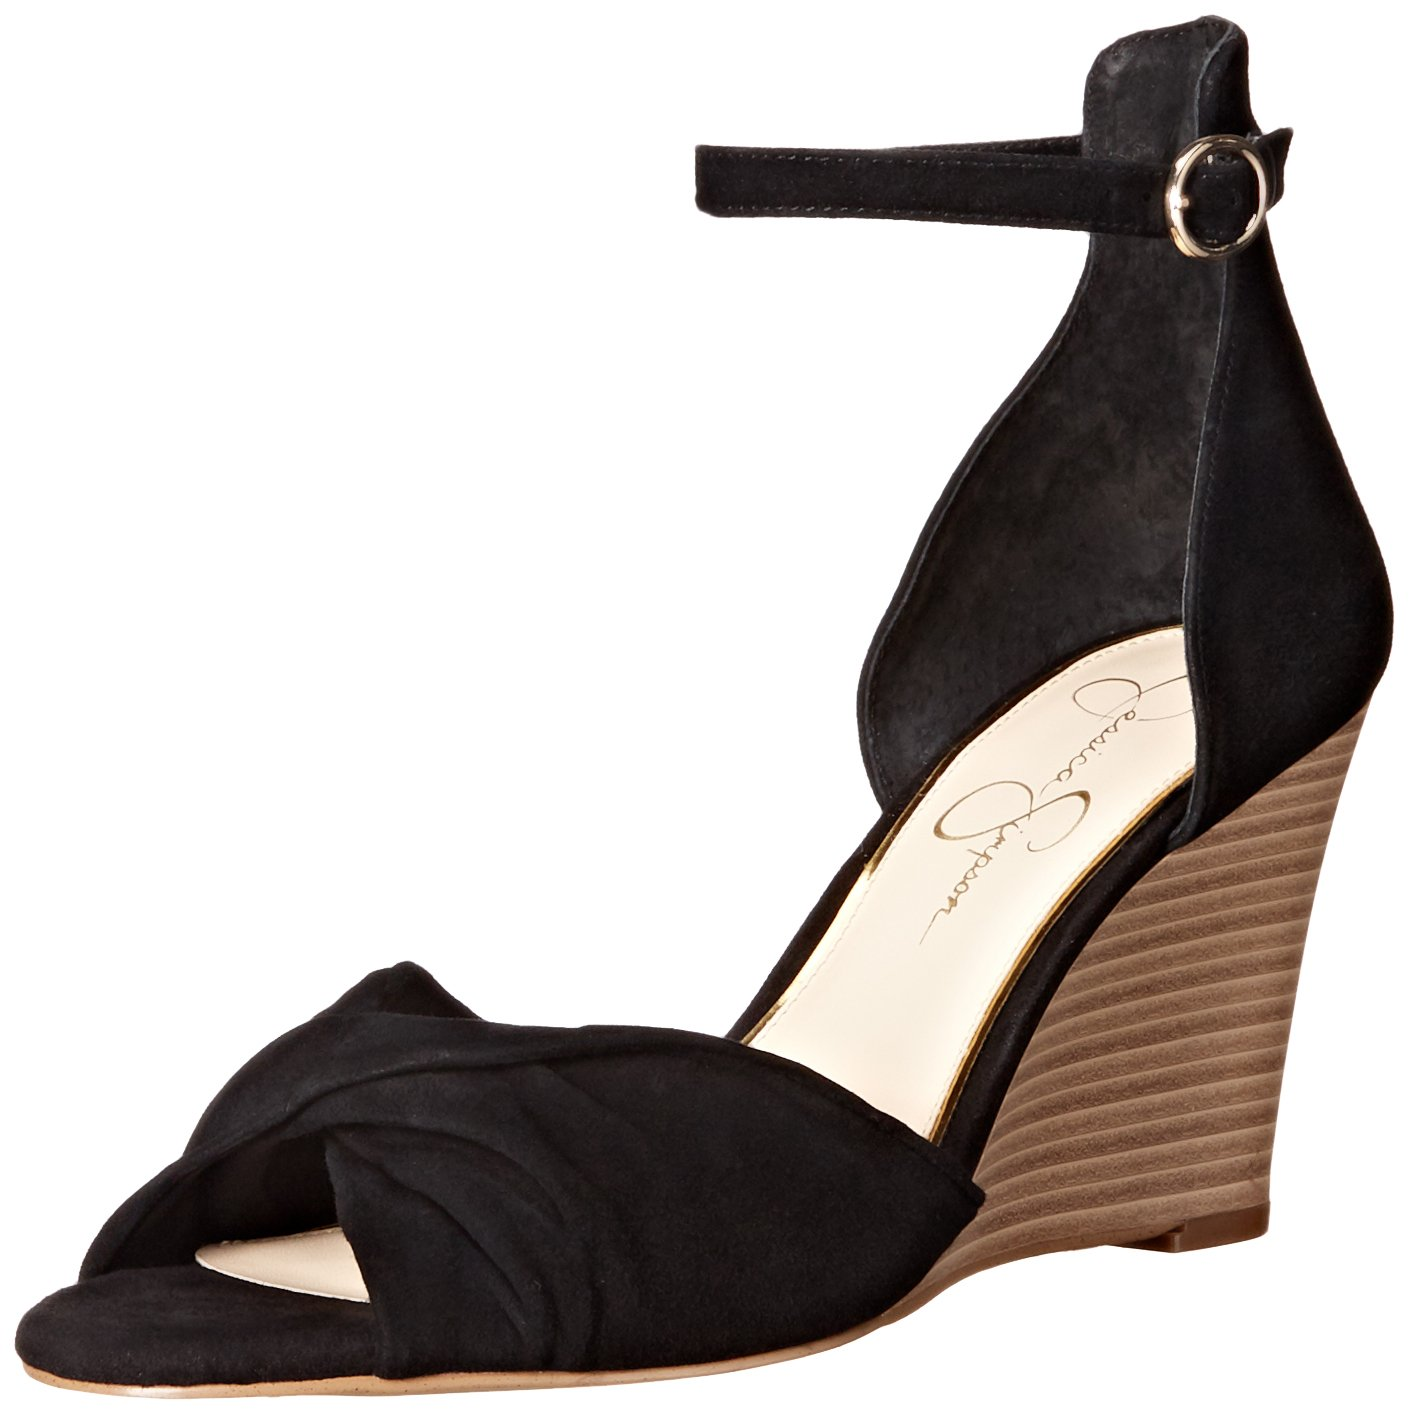 Jessica Simpson Women's LINDELLA Wedge Sandal B01CE5IURI 8.5 B(M) US|Black